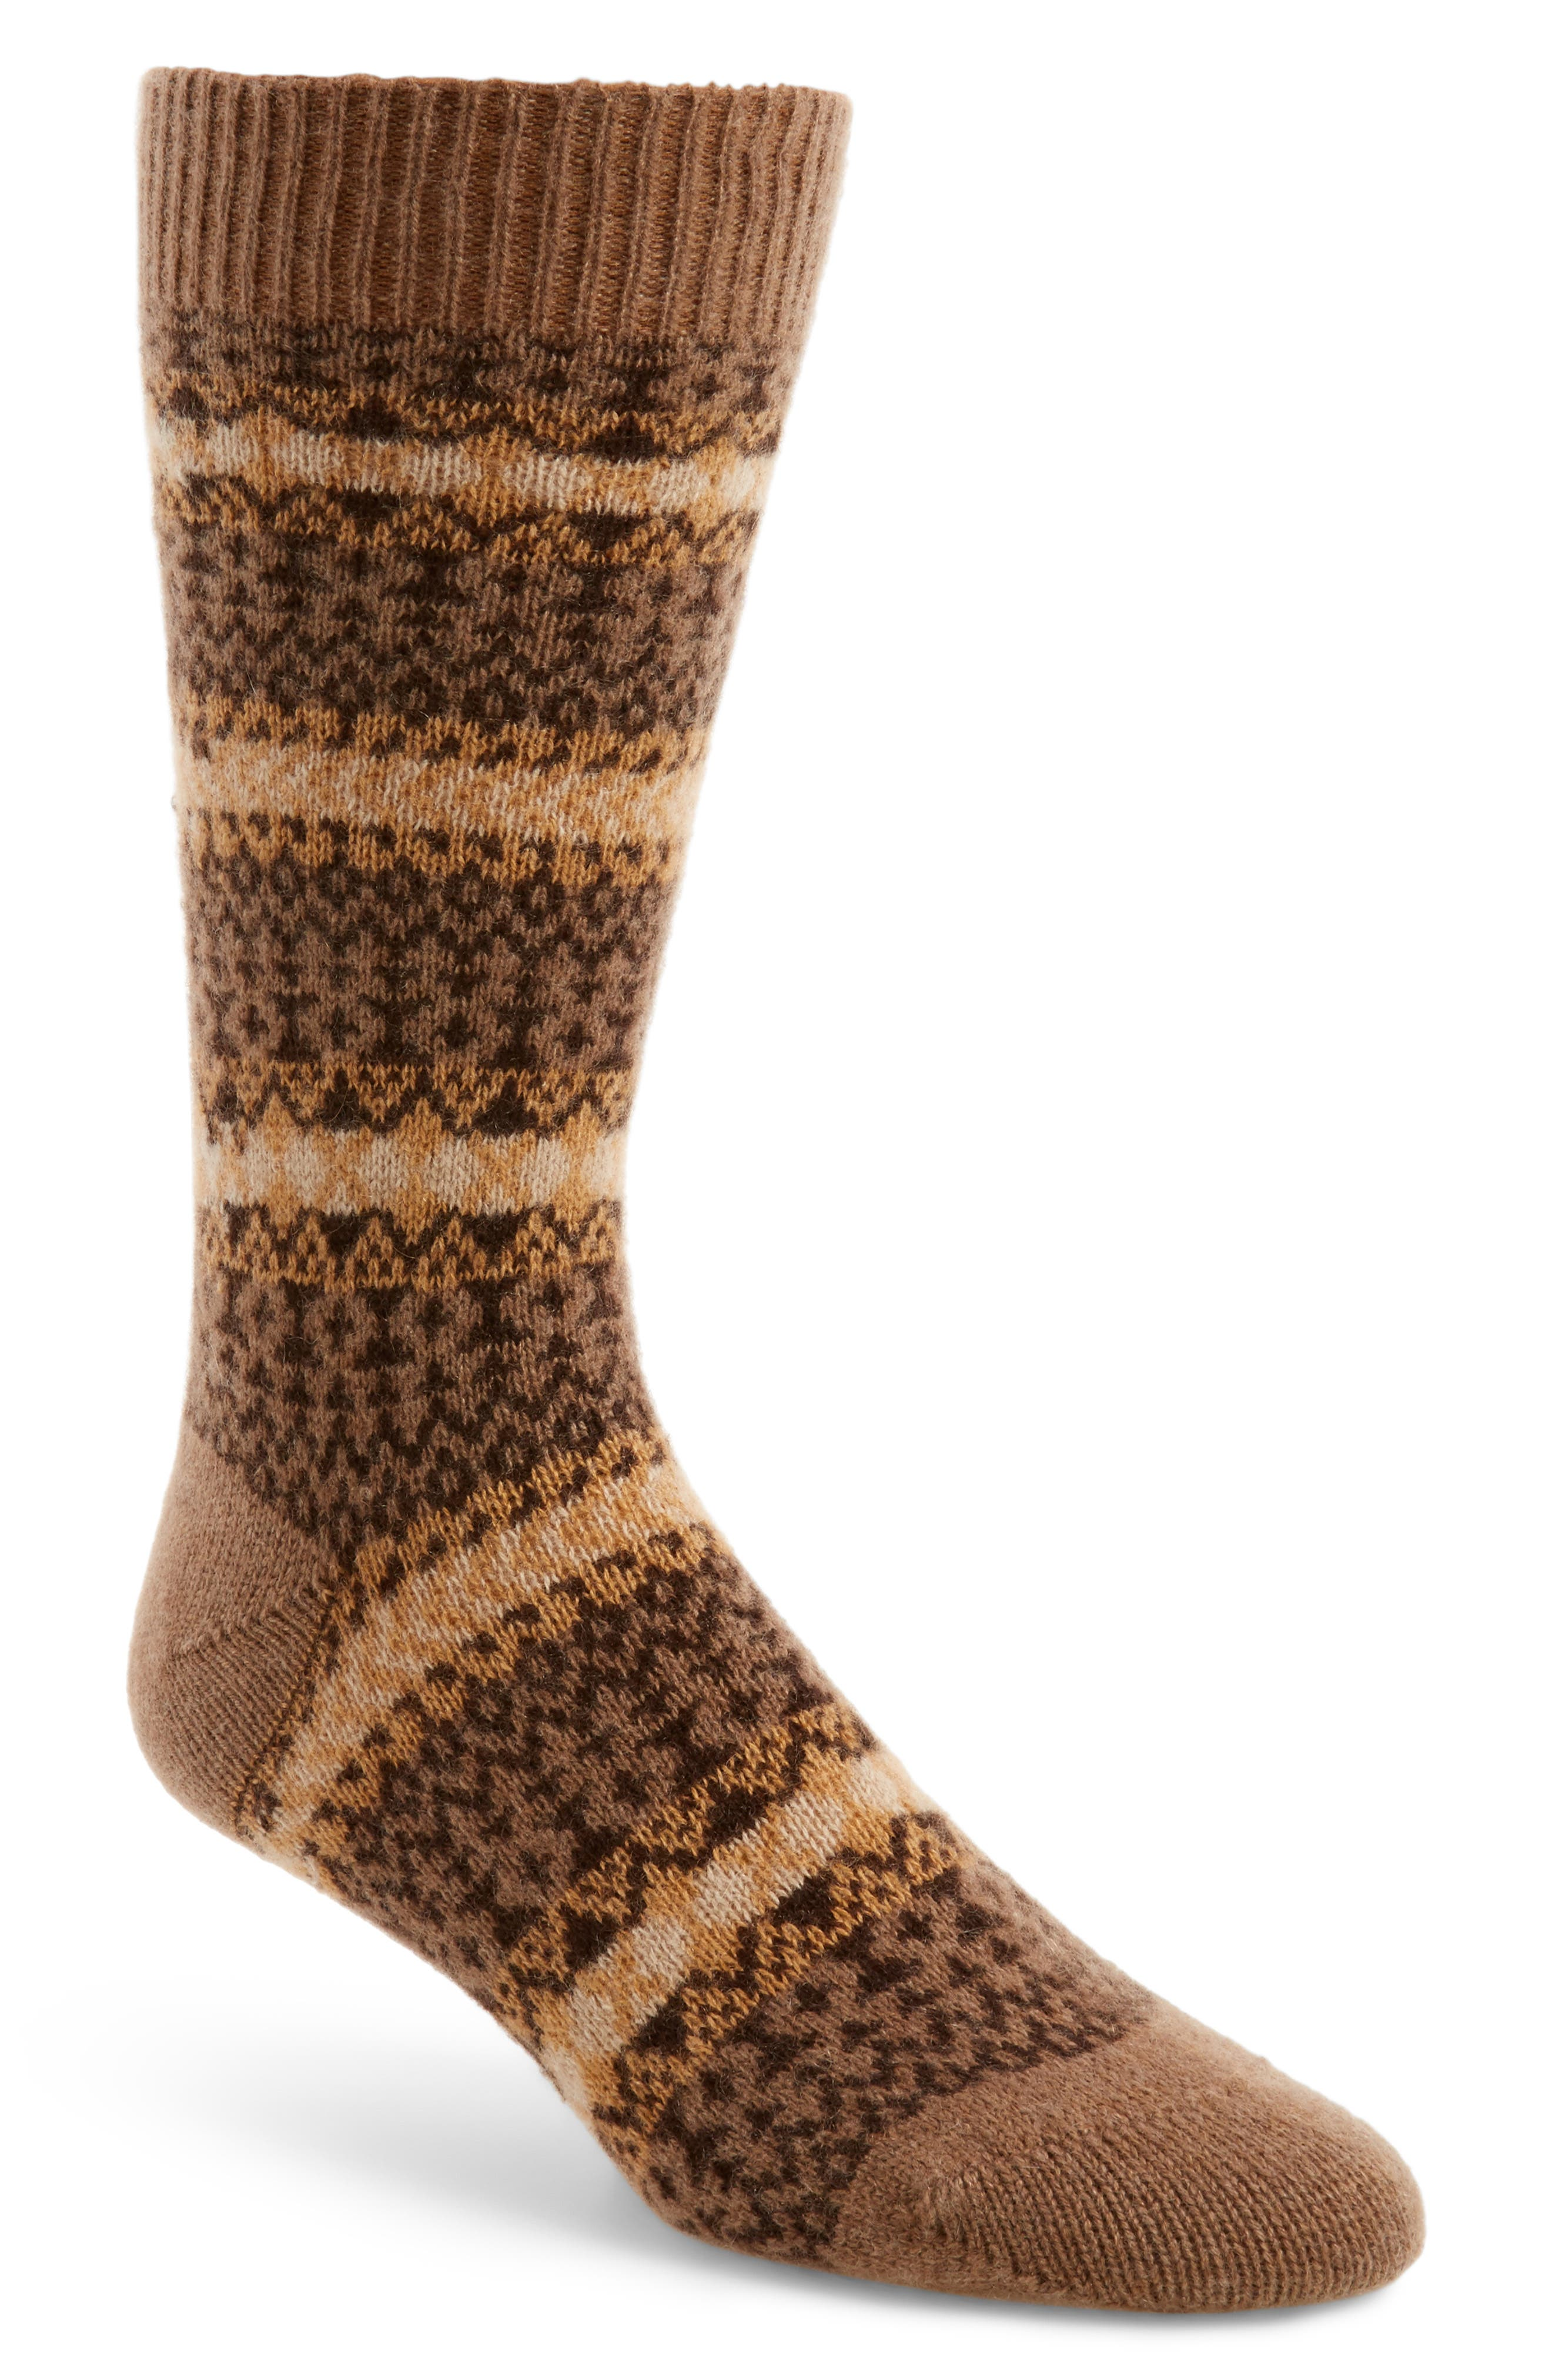 Fair Isle Cashmere Socks,                             Main thumbnail 1, color,                             261